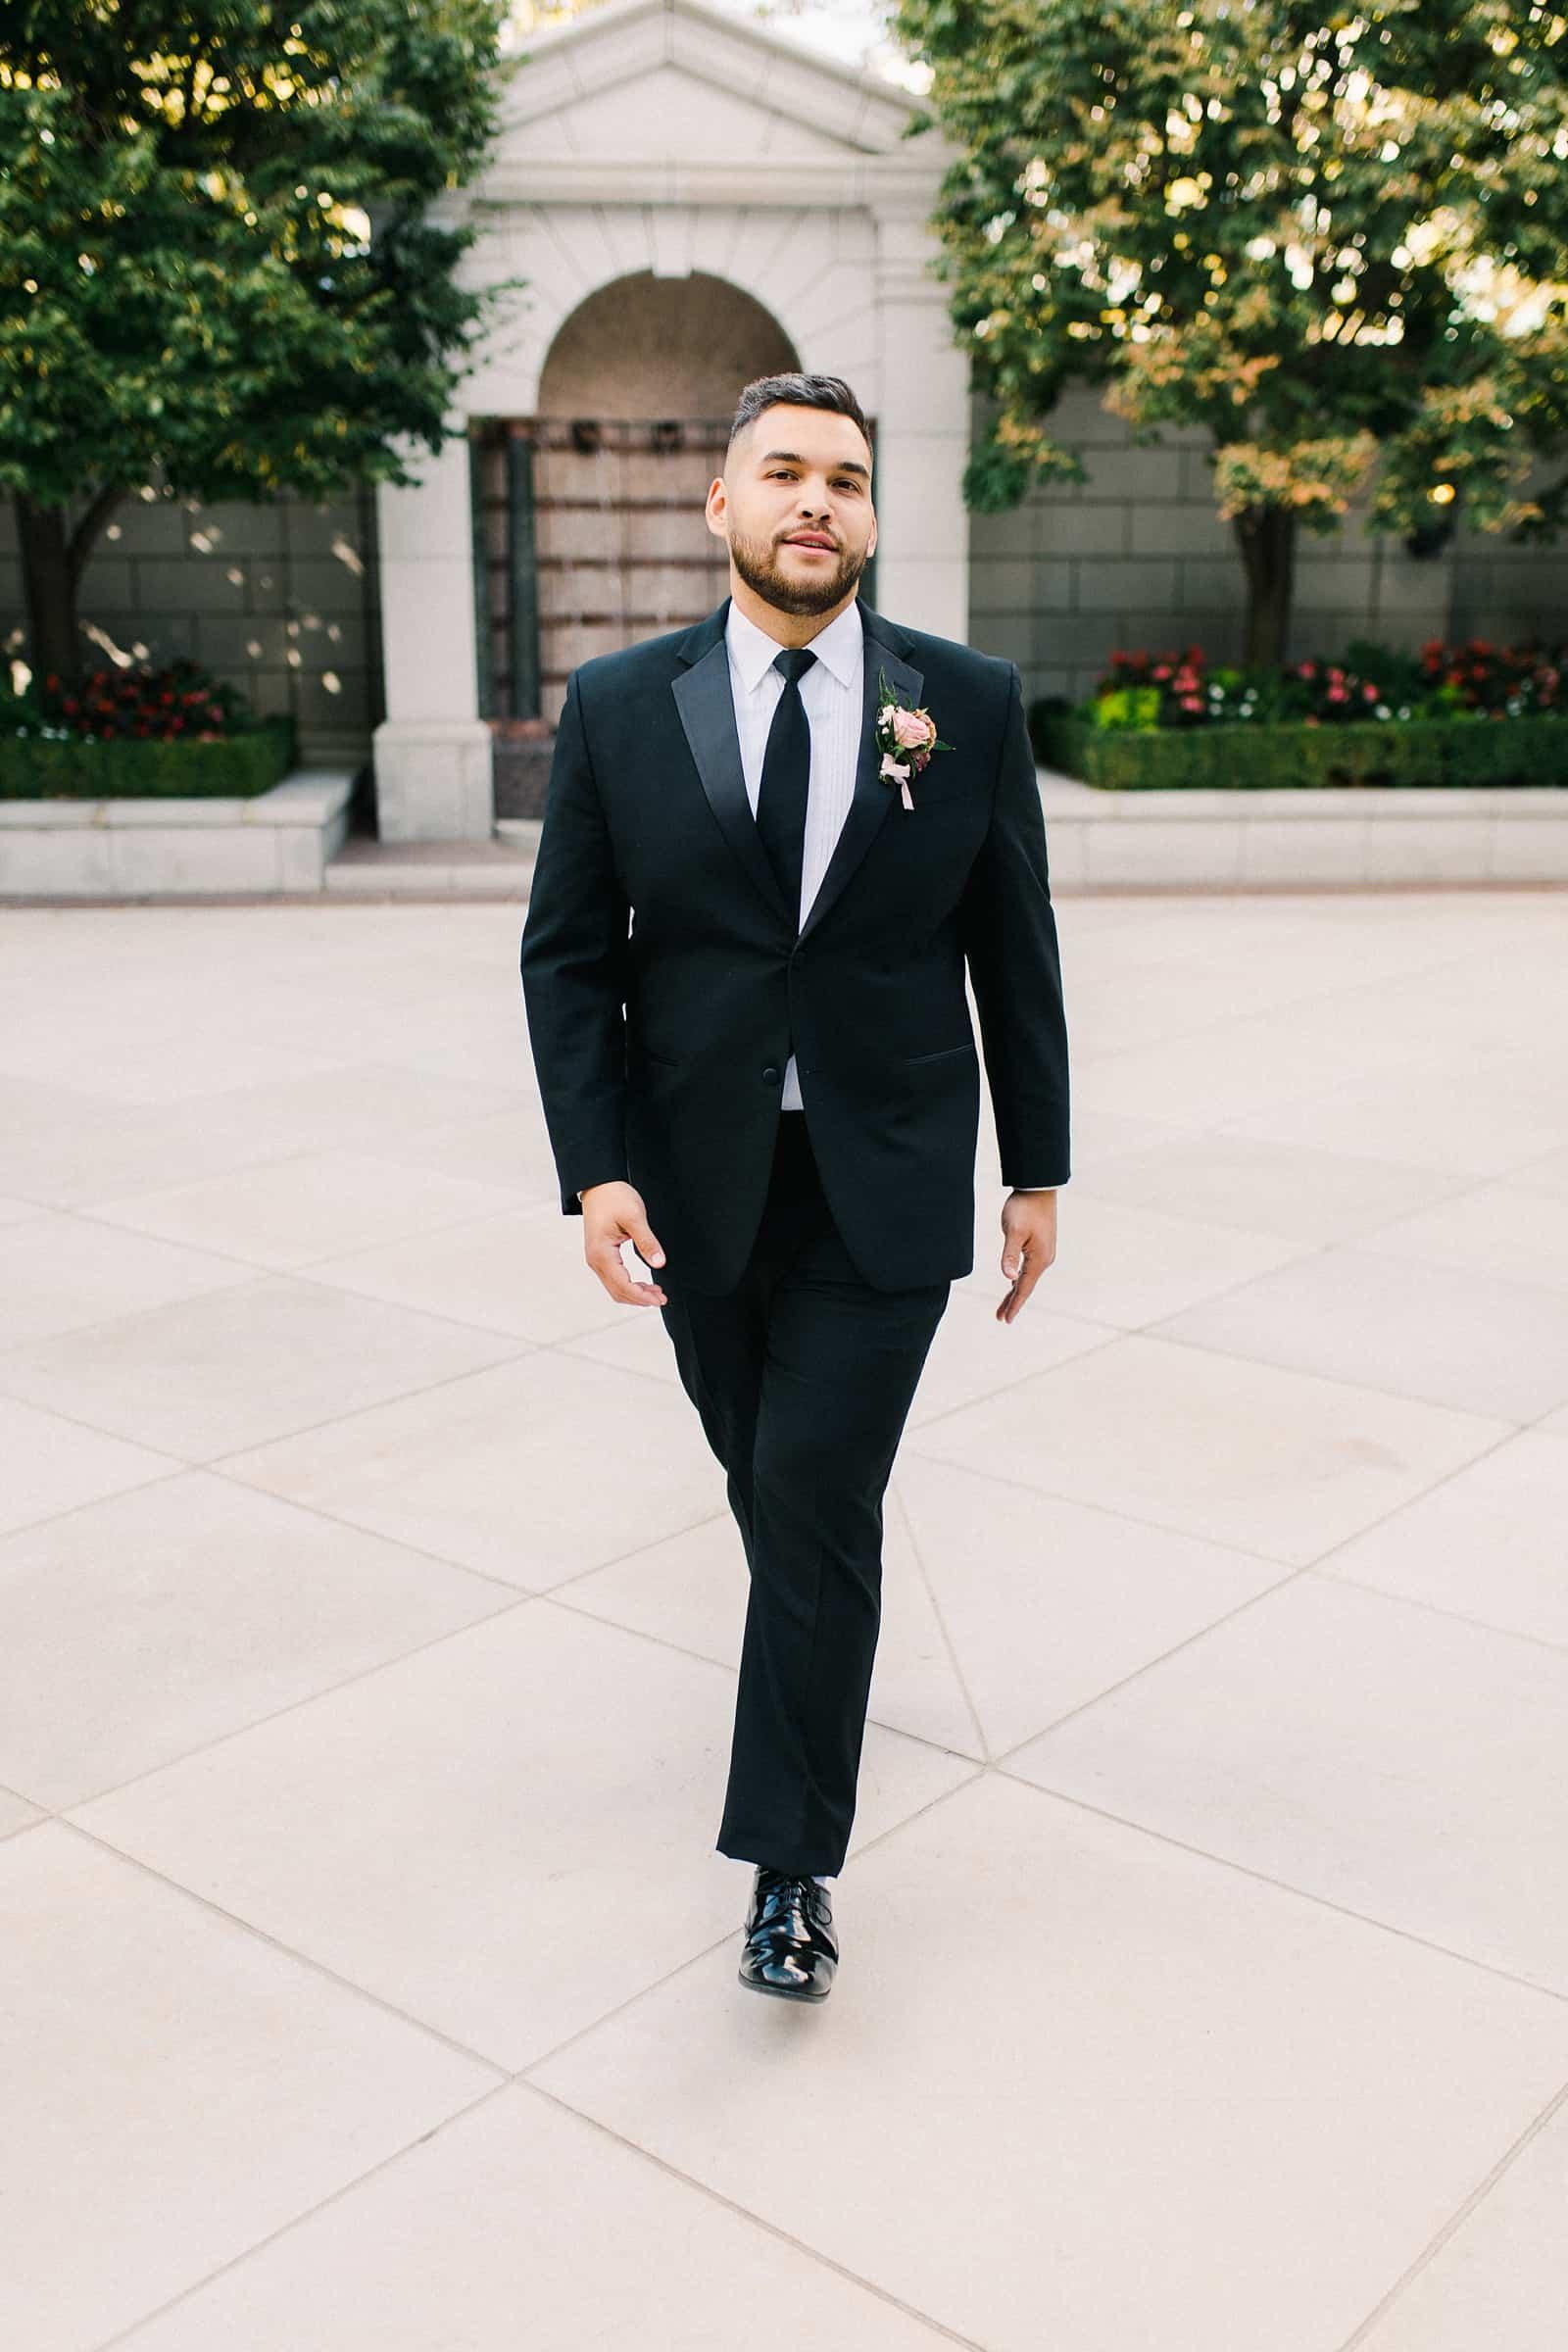 Groom wearing classic black tuxedo